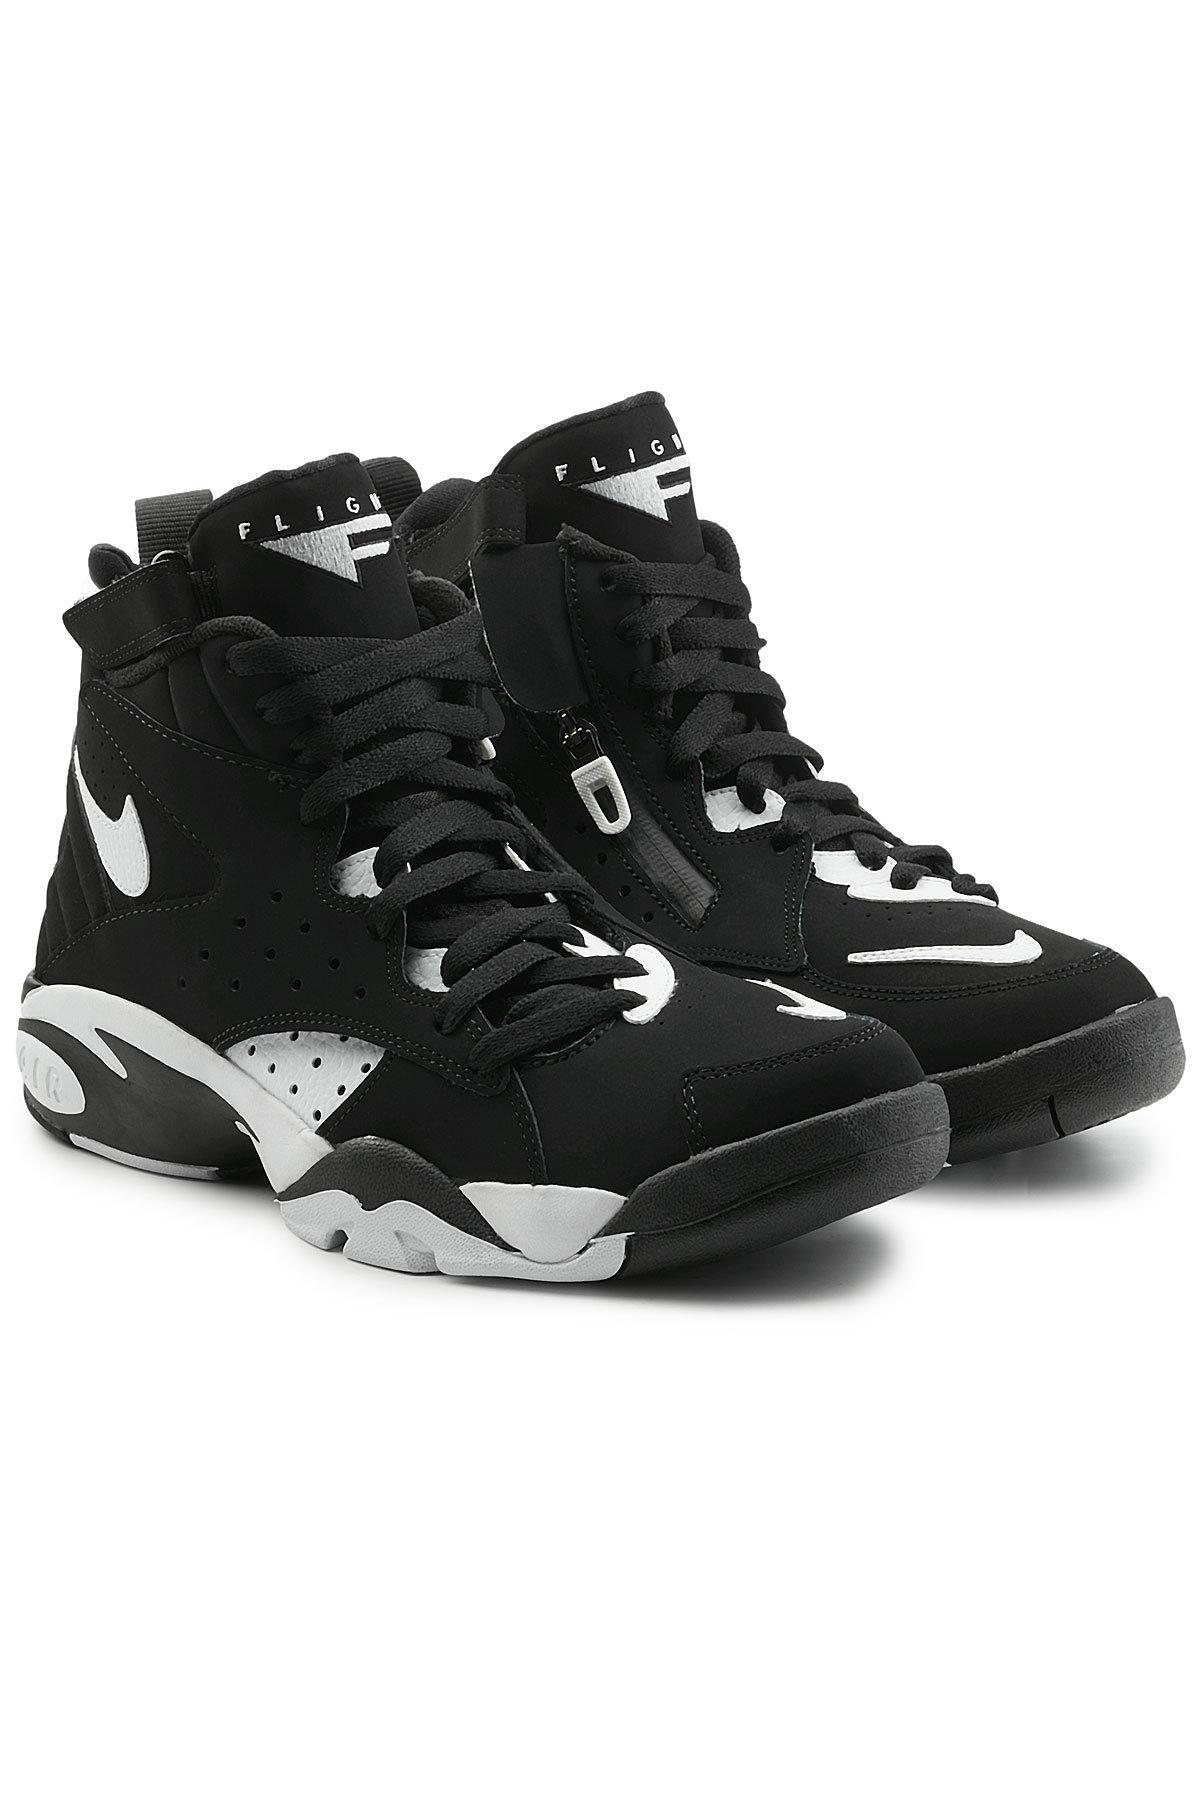 f65f4fed20a1ba Lyst - Nike Air Maestro Ii Ltd Men s Shoe in Black for Men - Save 47%